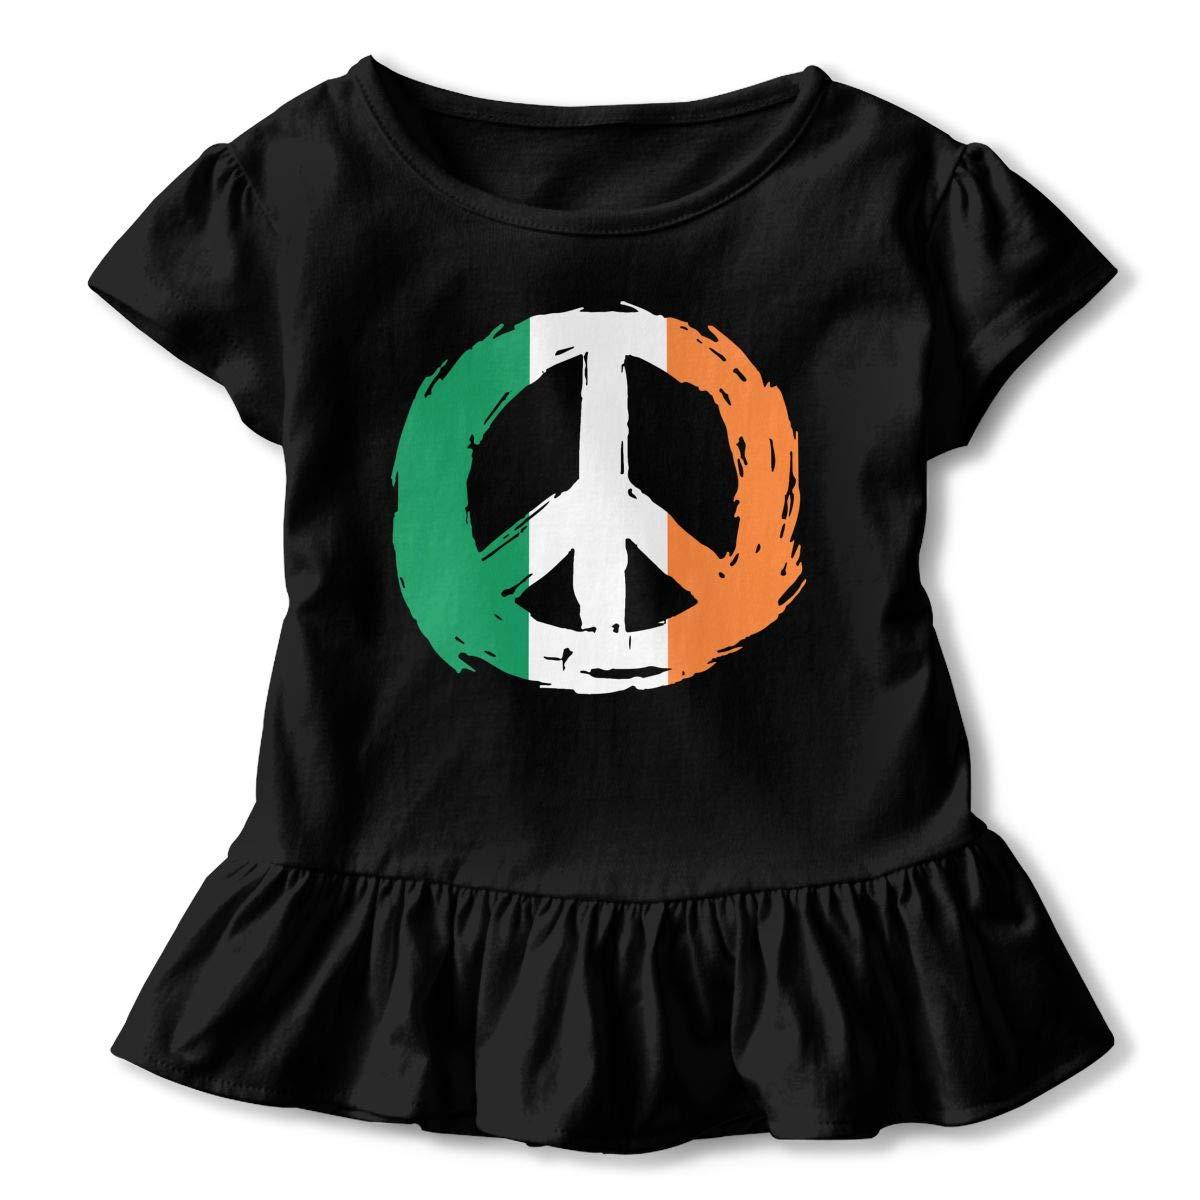 SHIRT1-KIDS Irish Flag Peace T-Shirts Childrens Girls Short Sleeve Ruffles Shirt Tee for 2-6T